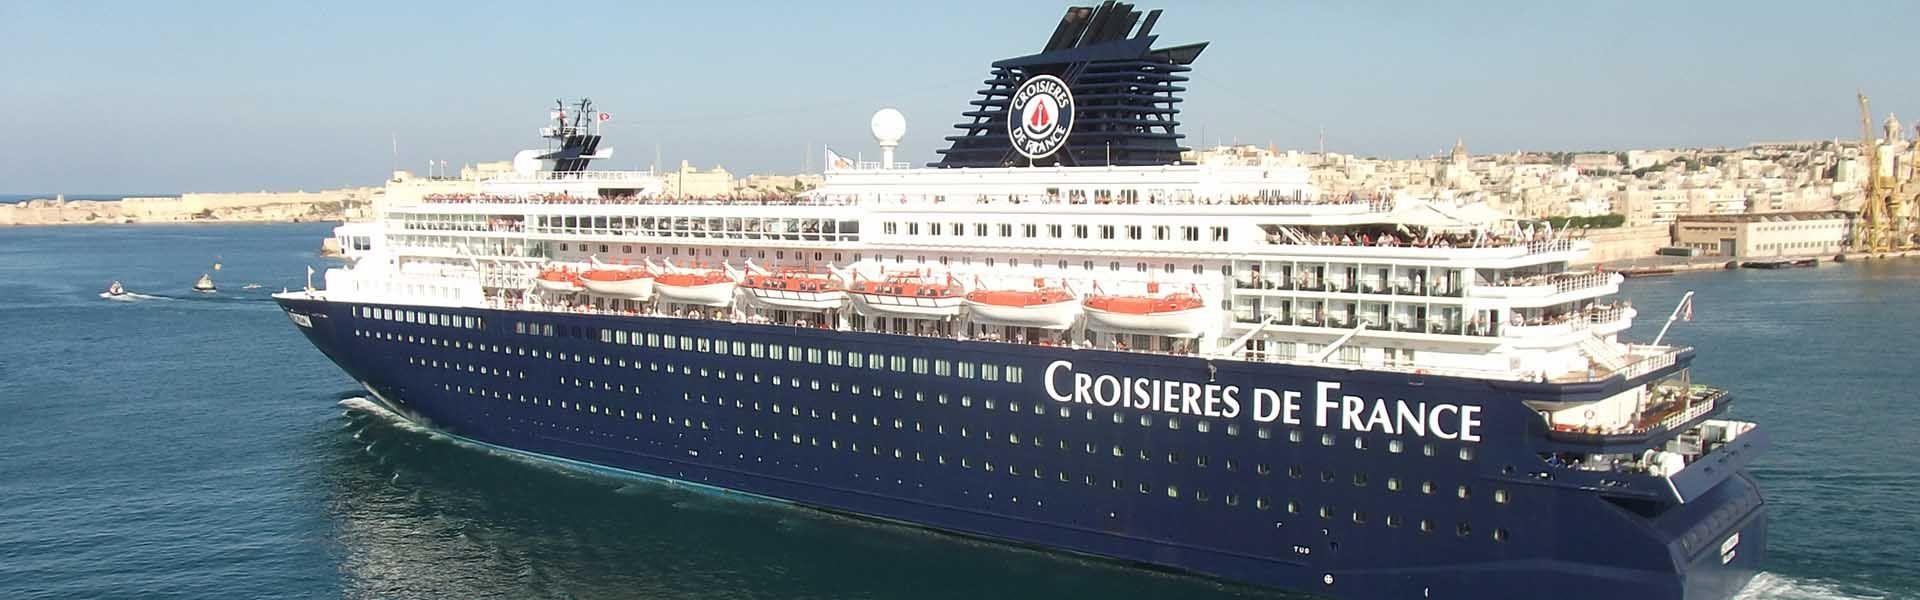 Croaziera 2017 - Mediterana de Vest (Malaga) - Pullmantur Cruises - Horizon - 7 nopti